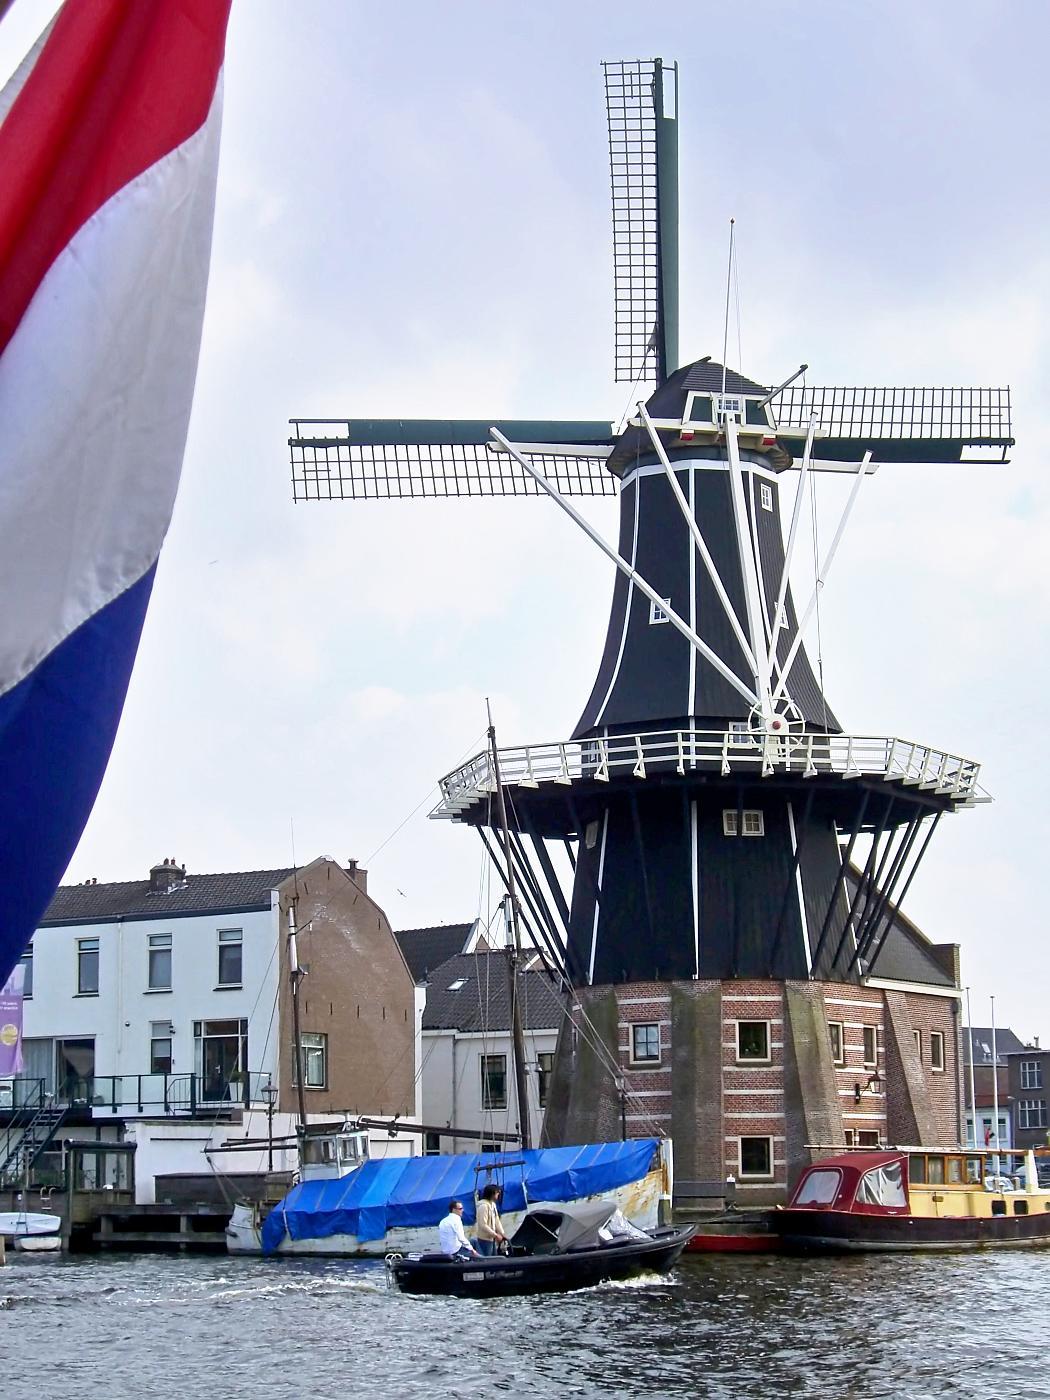 Windmolen in Haarlem